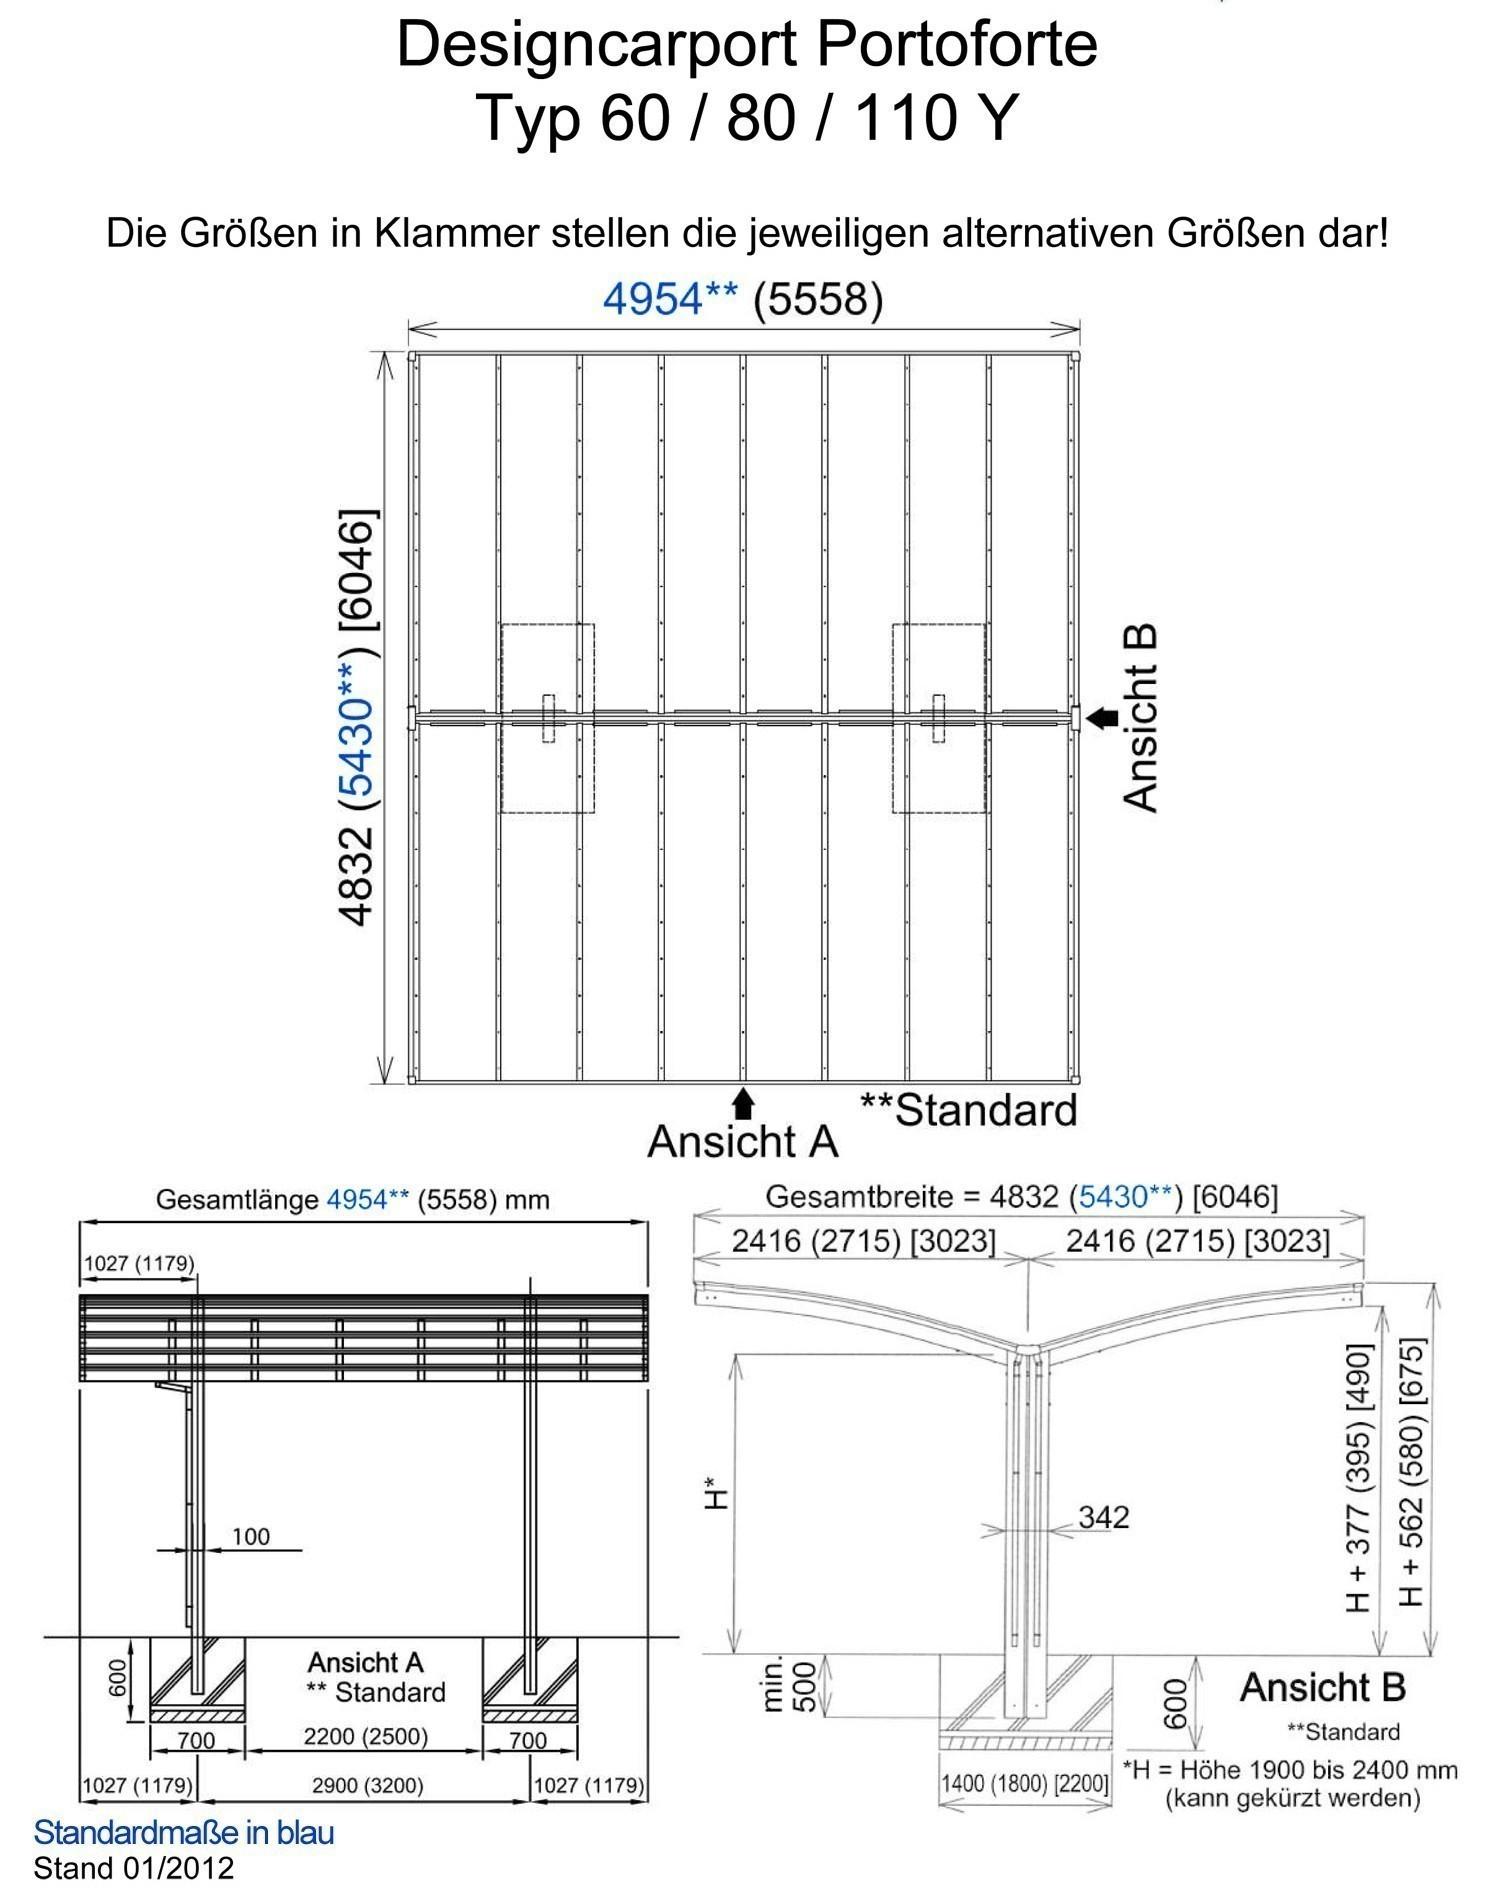 Carport XIMAX Portoforte Alu Typ 80 Y mattbraun 495x543x248cm Bild 2